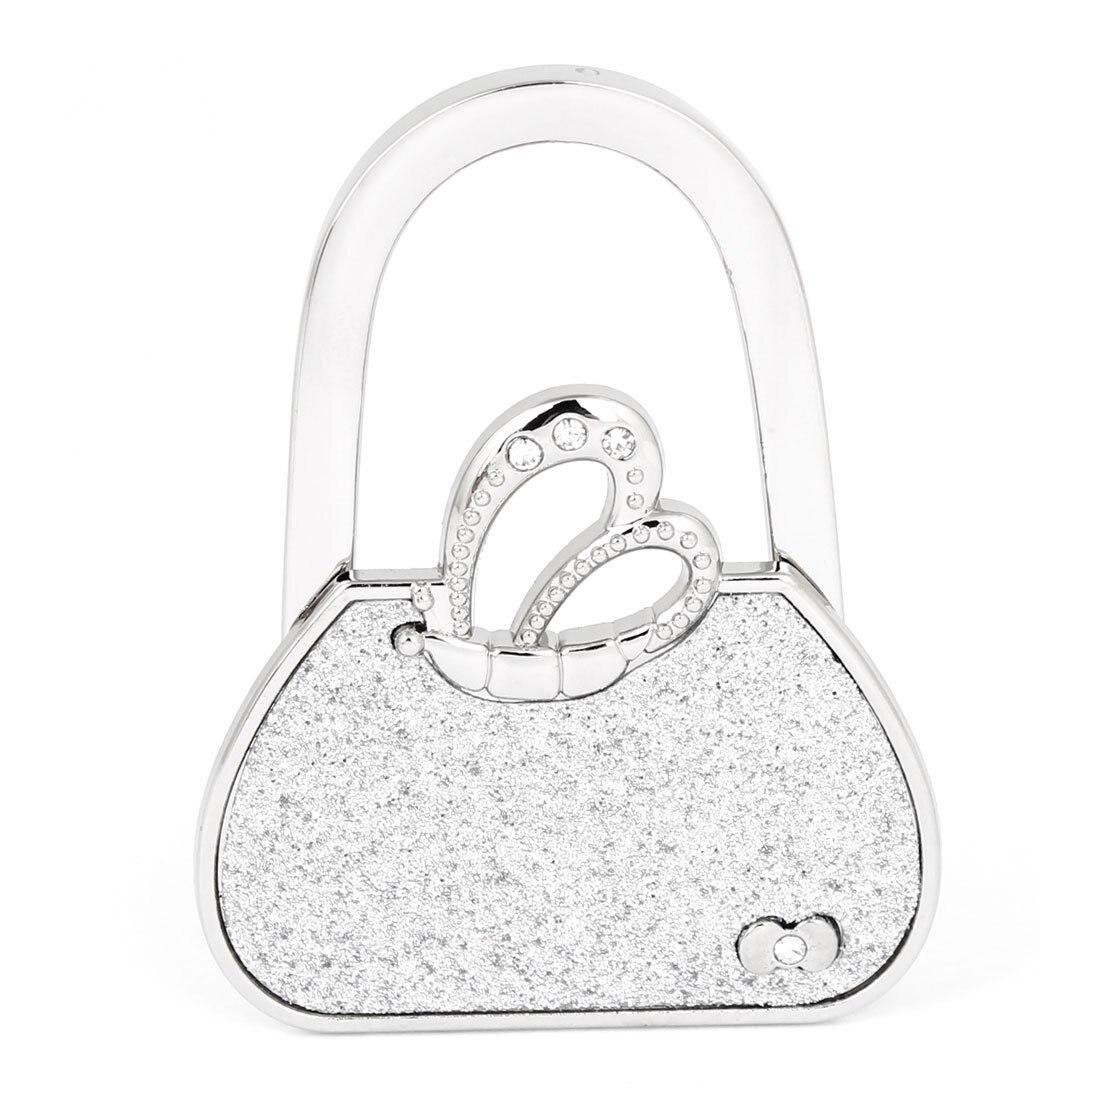 Hgho-Бабочка Акцент складной стол крюк кошелек вешалка держатель для Для женщин